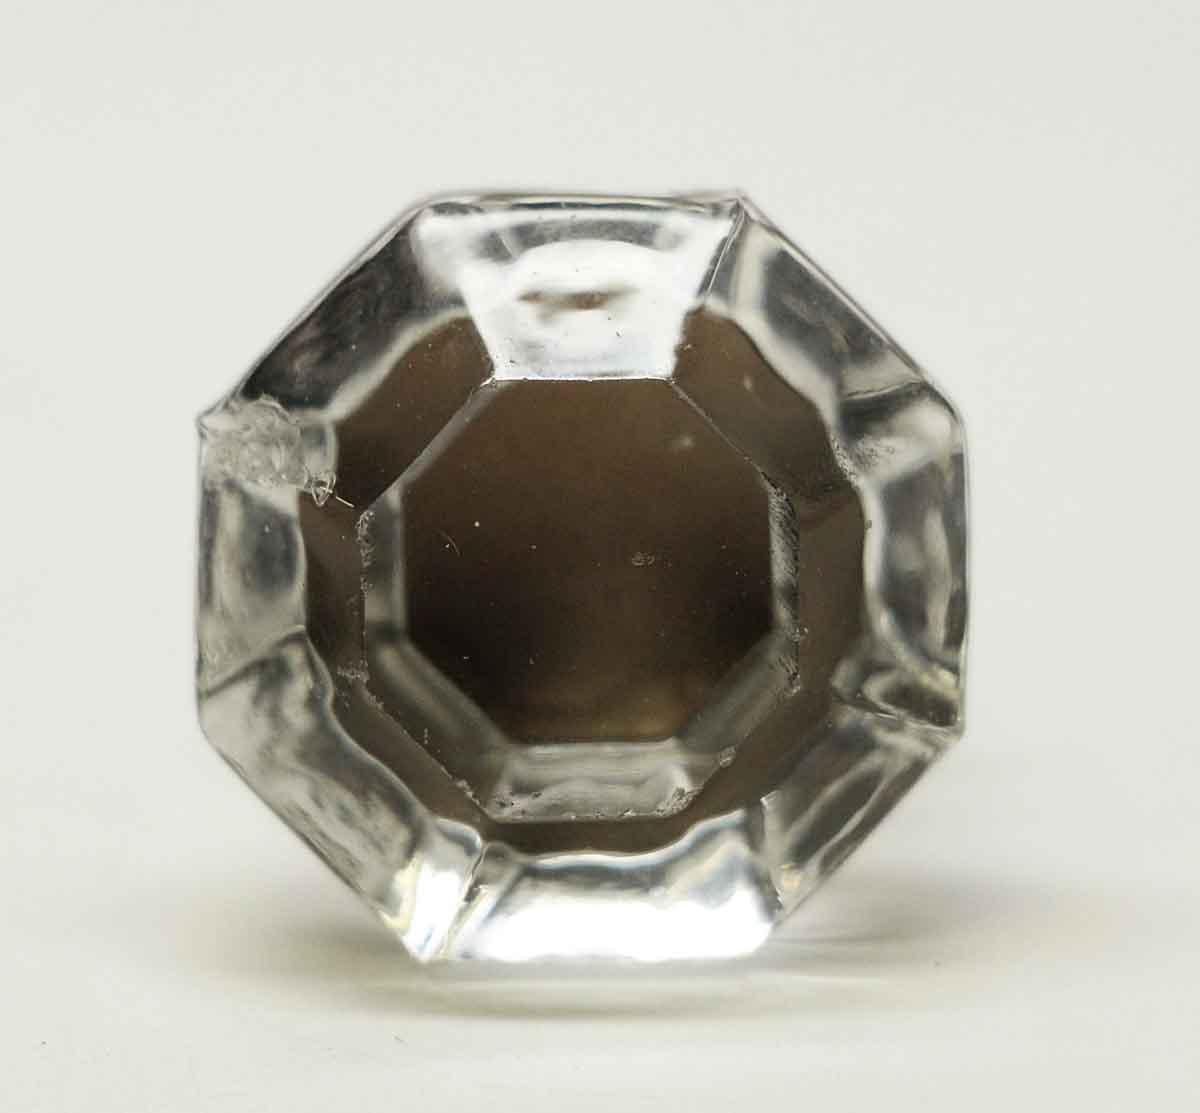 Vintage Faceted Octagon Glass Furniture Knob